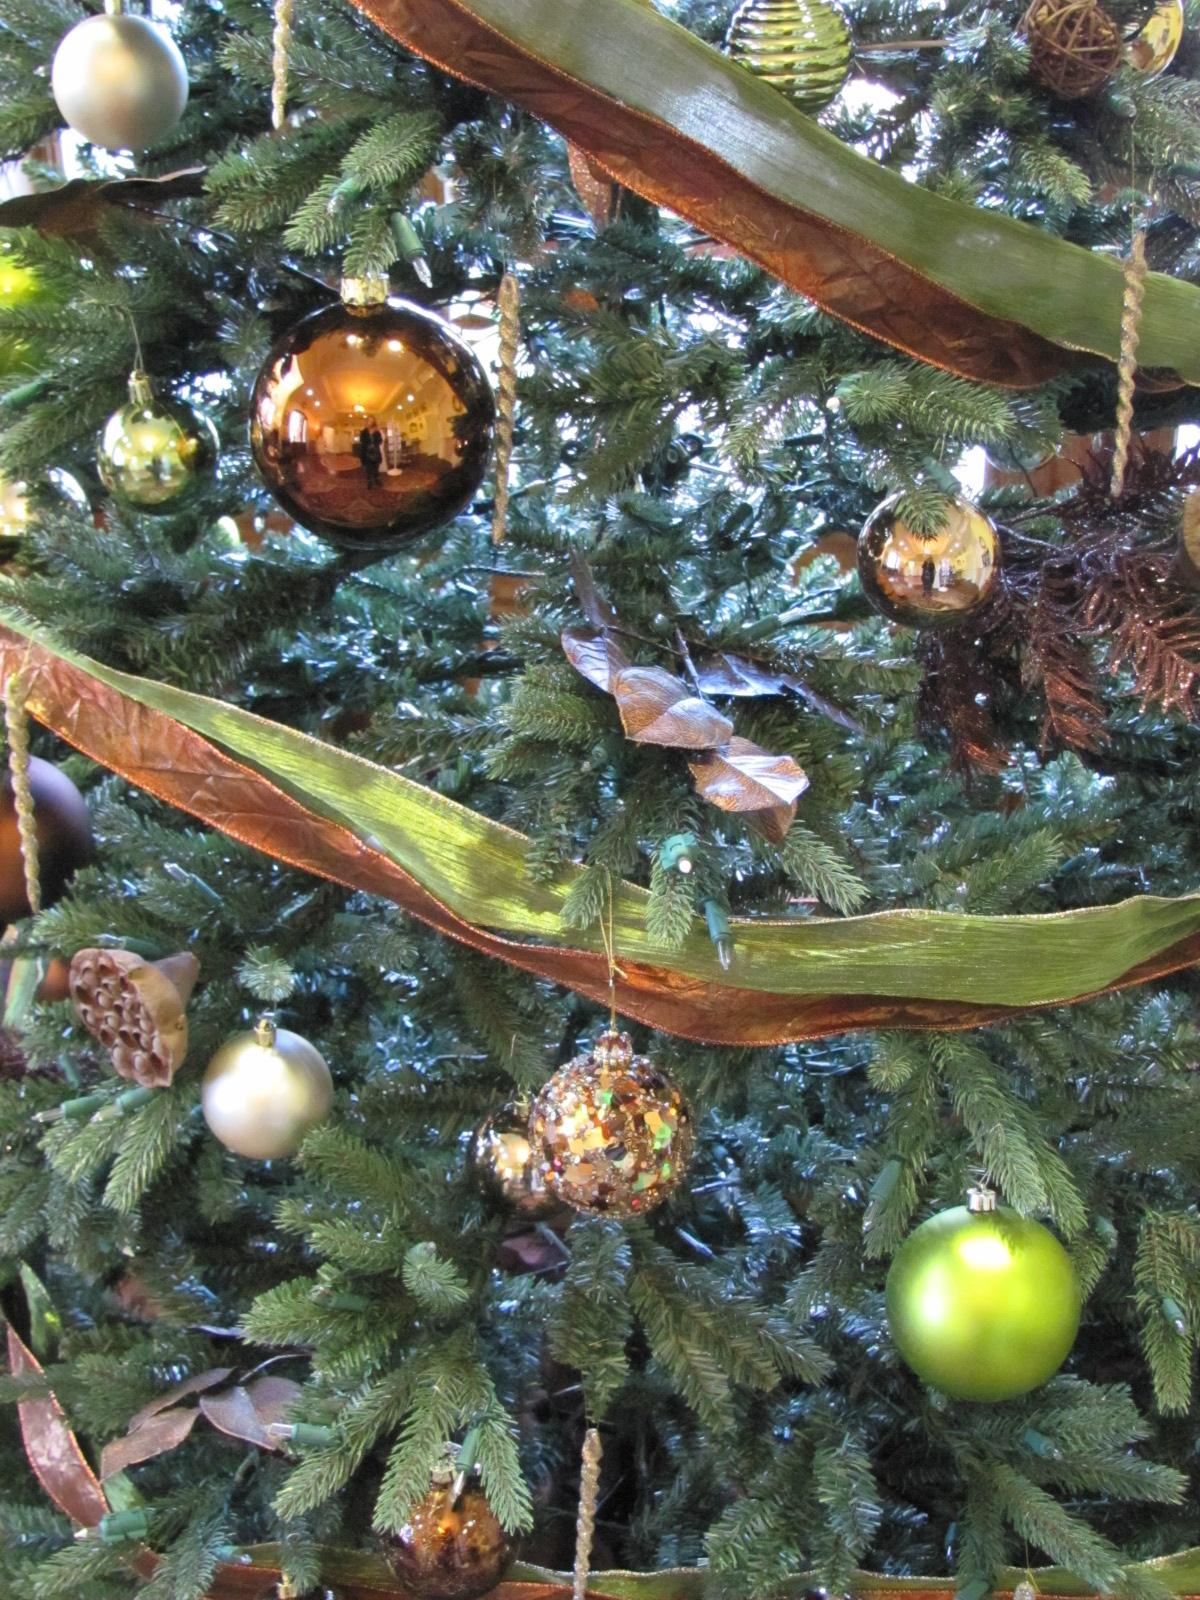 Seasonal Christmas Decor by Good Egg Organizing